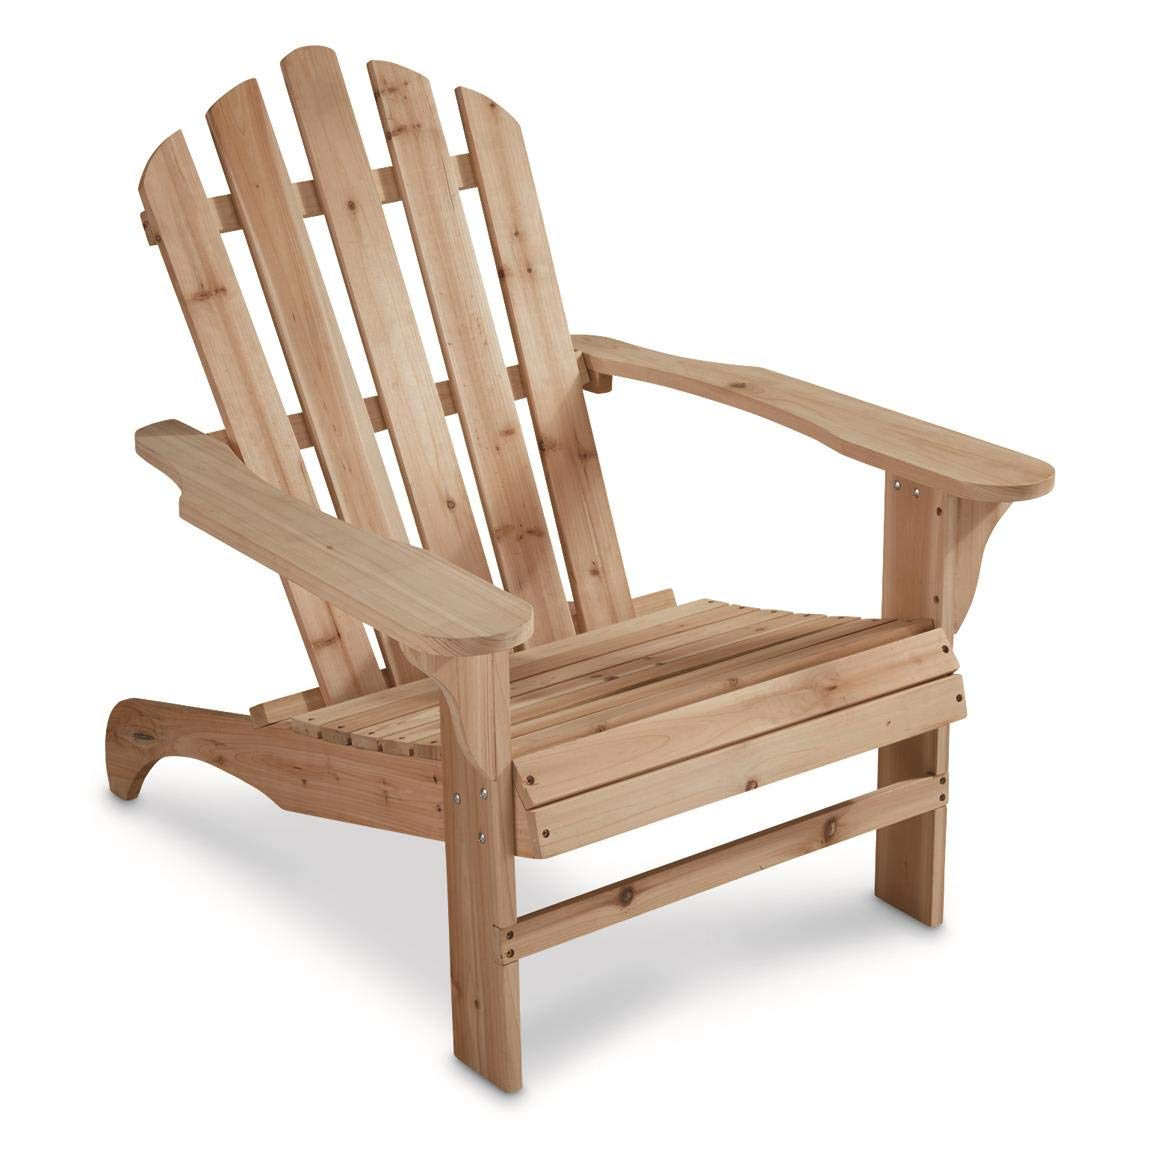 CASTLECREEK Oversized Adirondack Chair, 400-lb. Capacity